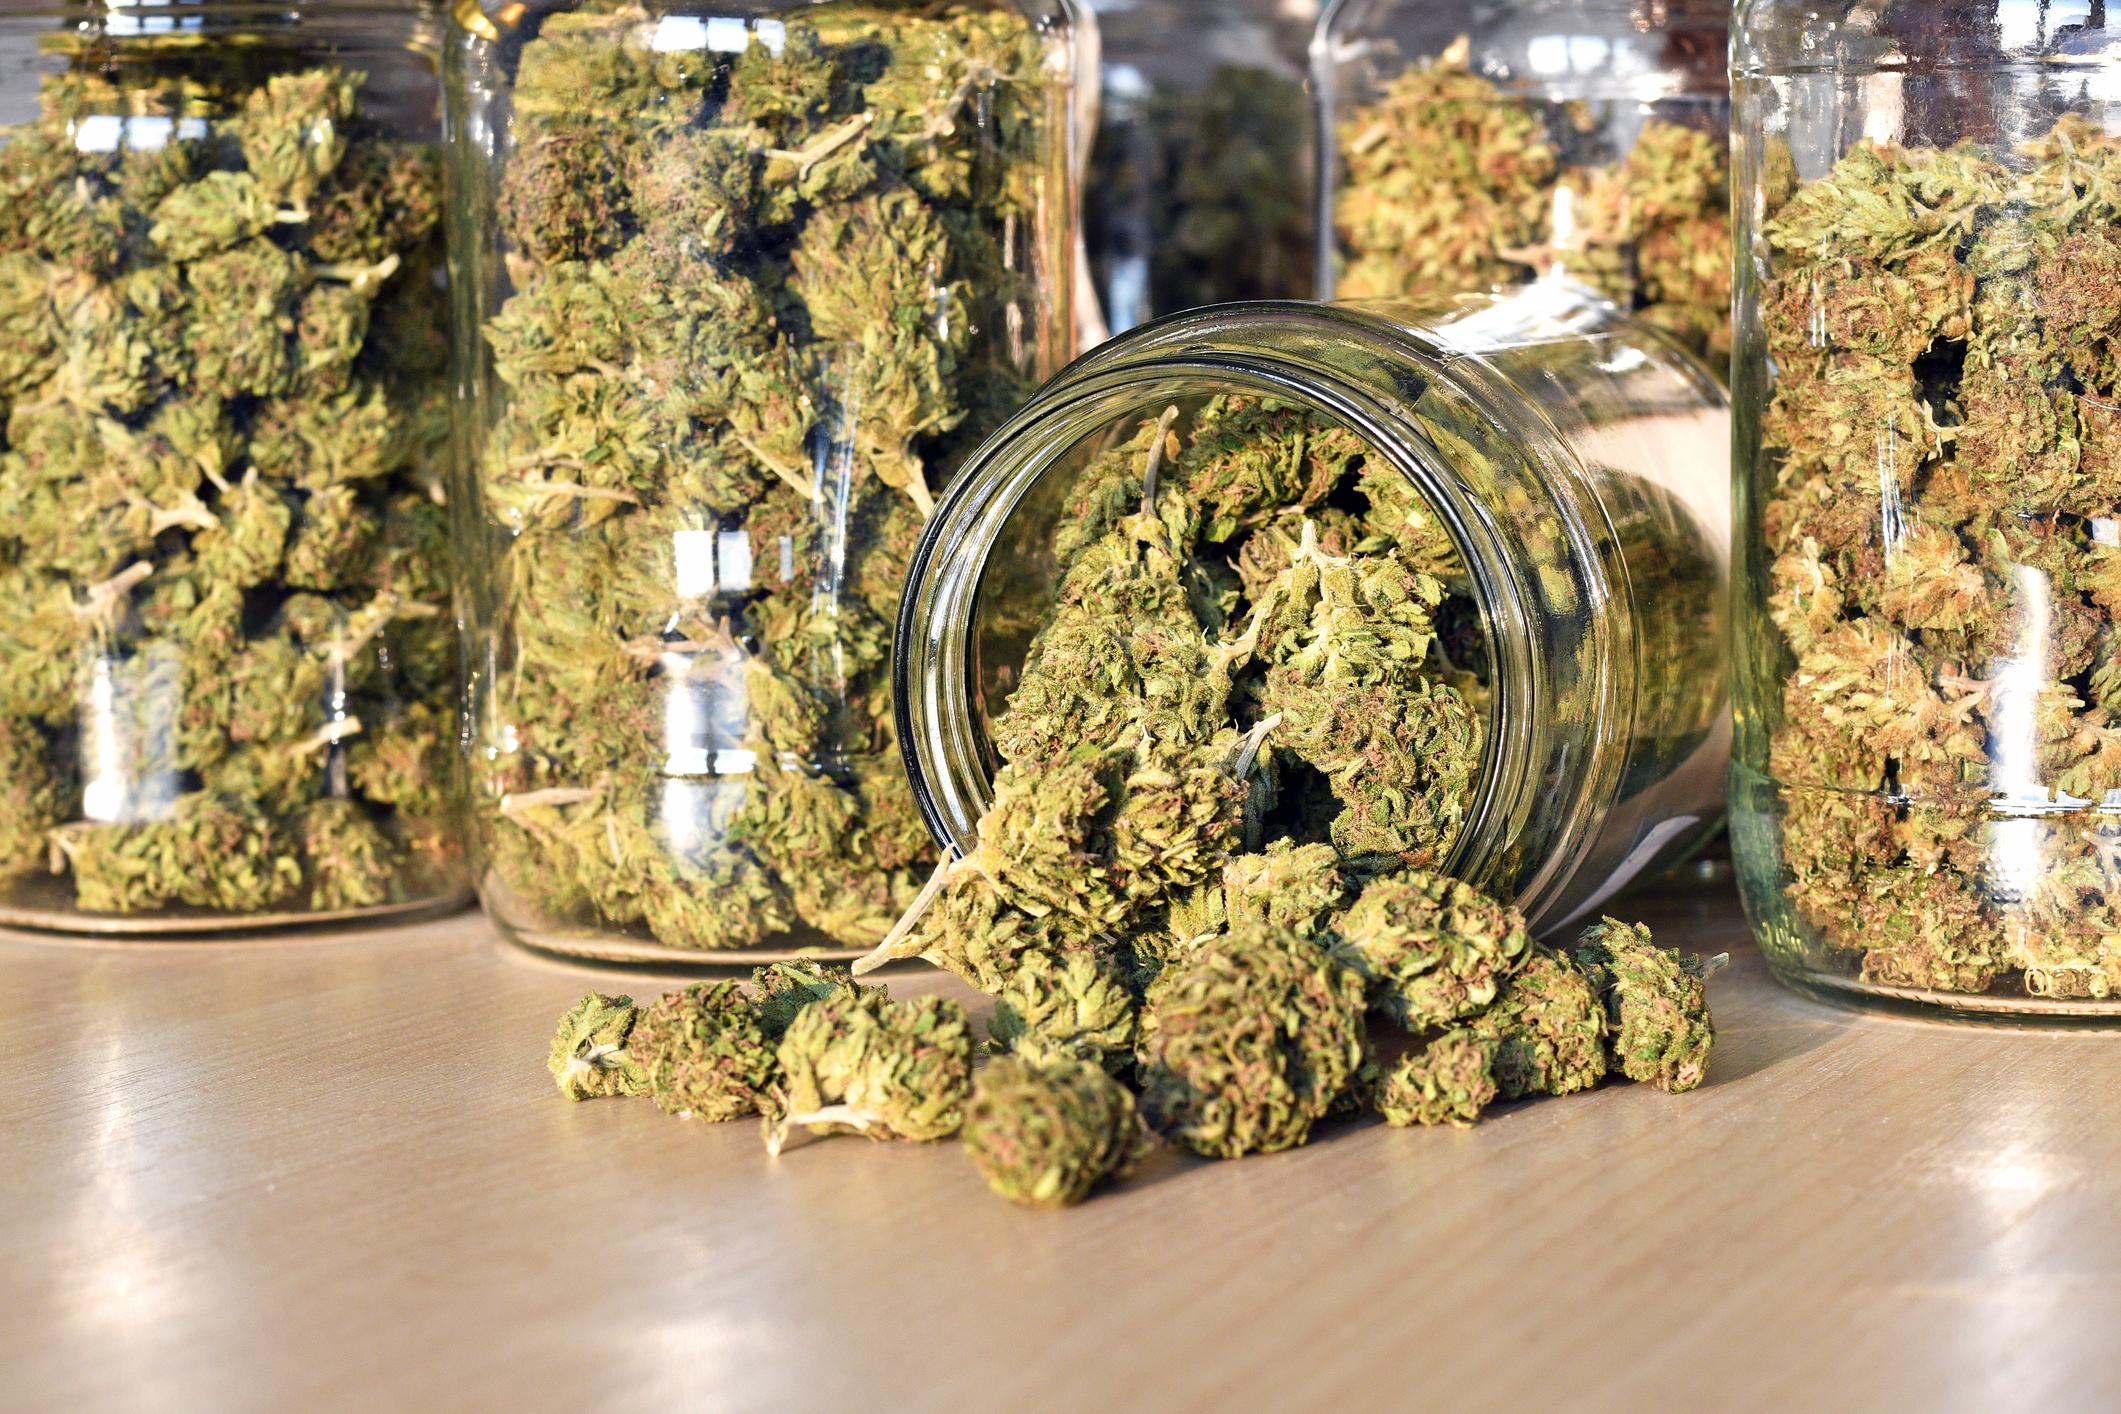 Marijuana in glass containers.